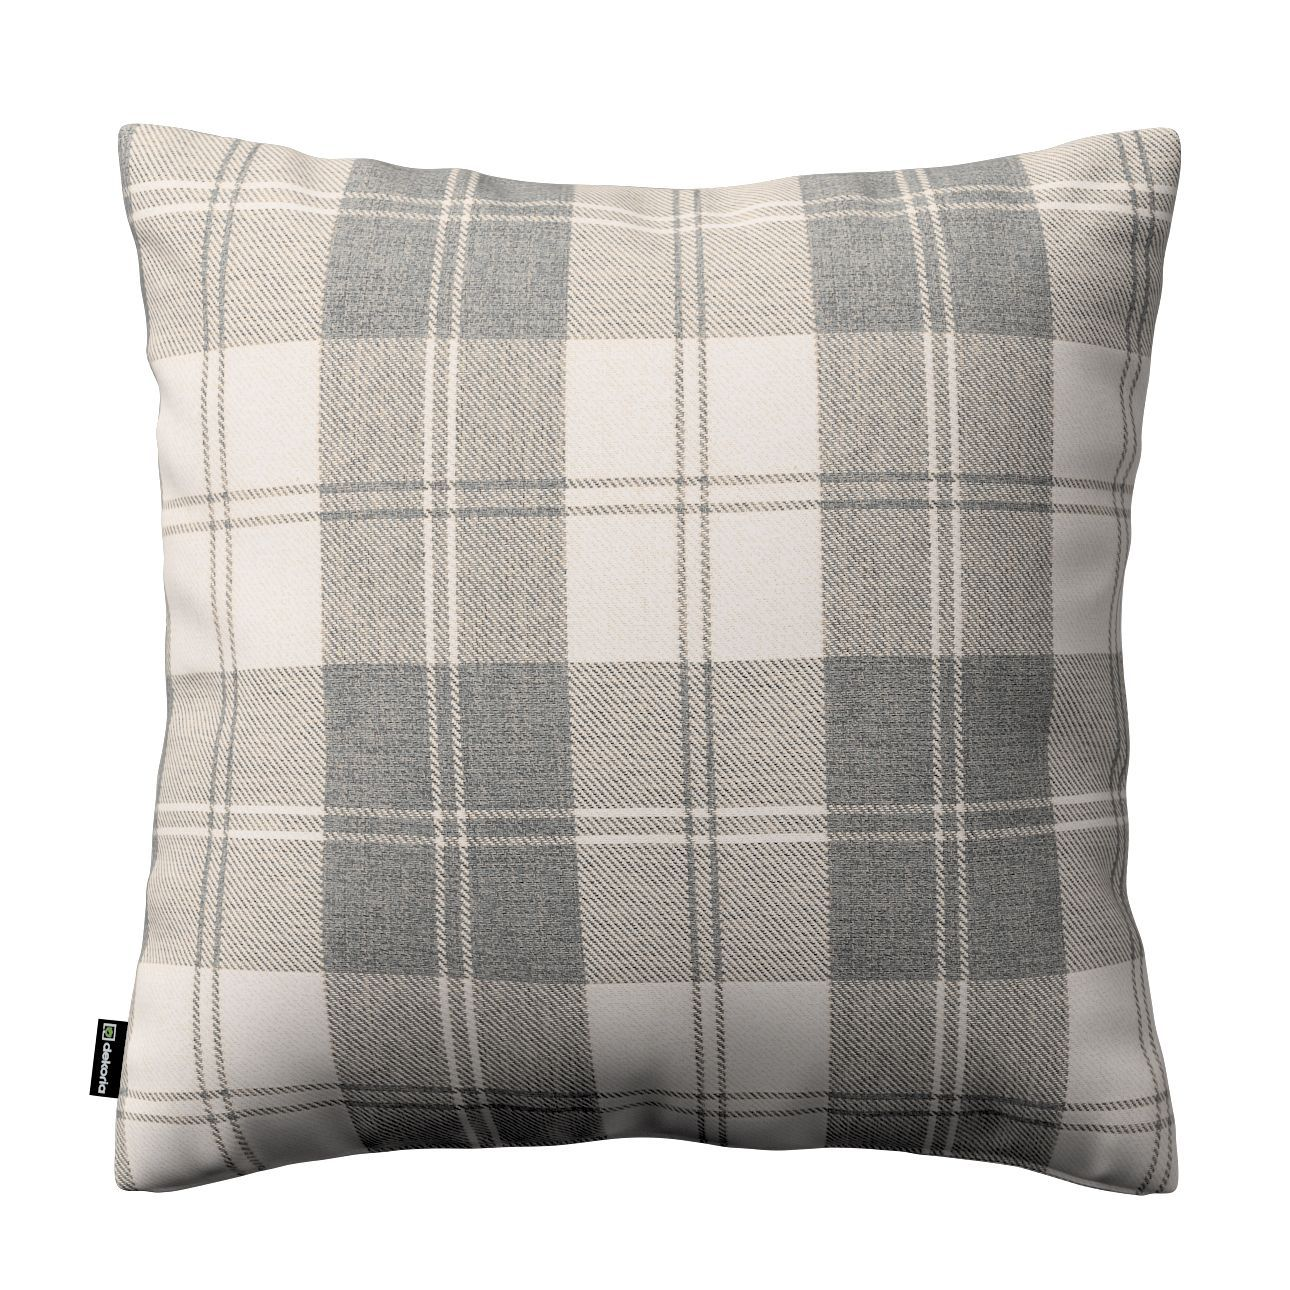 Kissen 80x80 Daunen Kopfkissen Kissen Design Couchkissen Grau